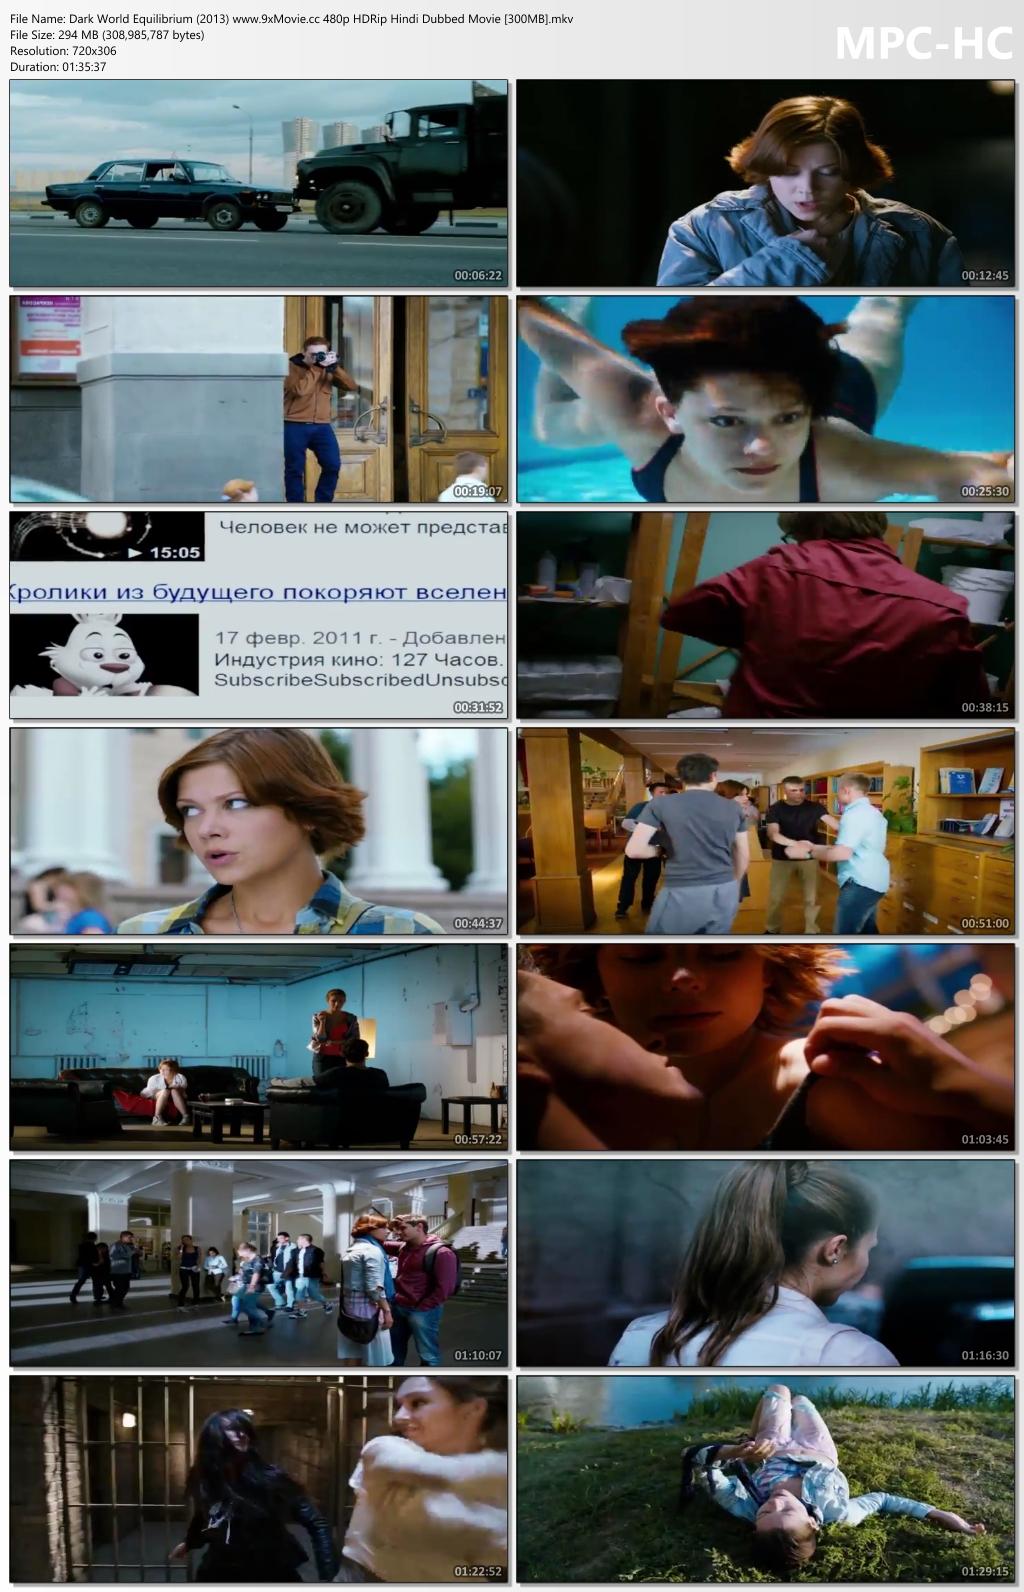 Dark-World-Equilibrium-2013-www-9x-Movie-cc-480p-HDRip-Hindi-Dubbed-Movie-300-MB-mkv